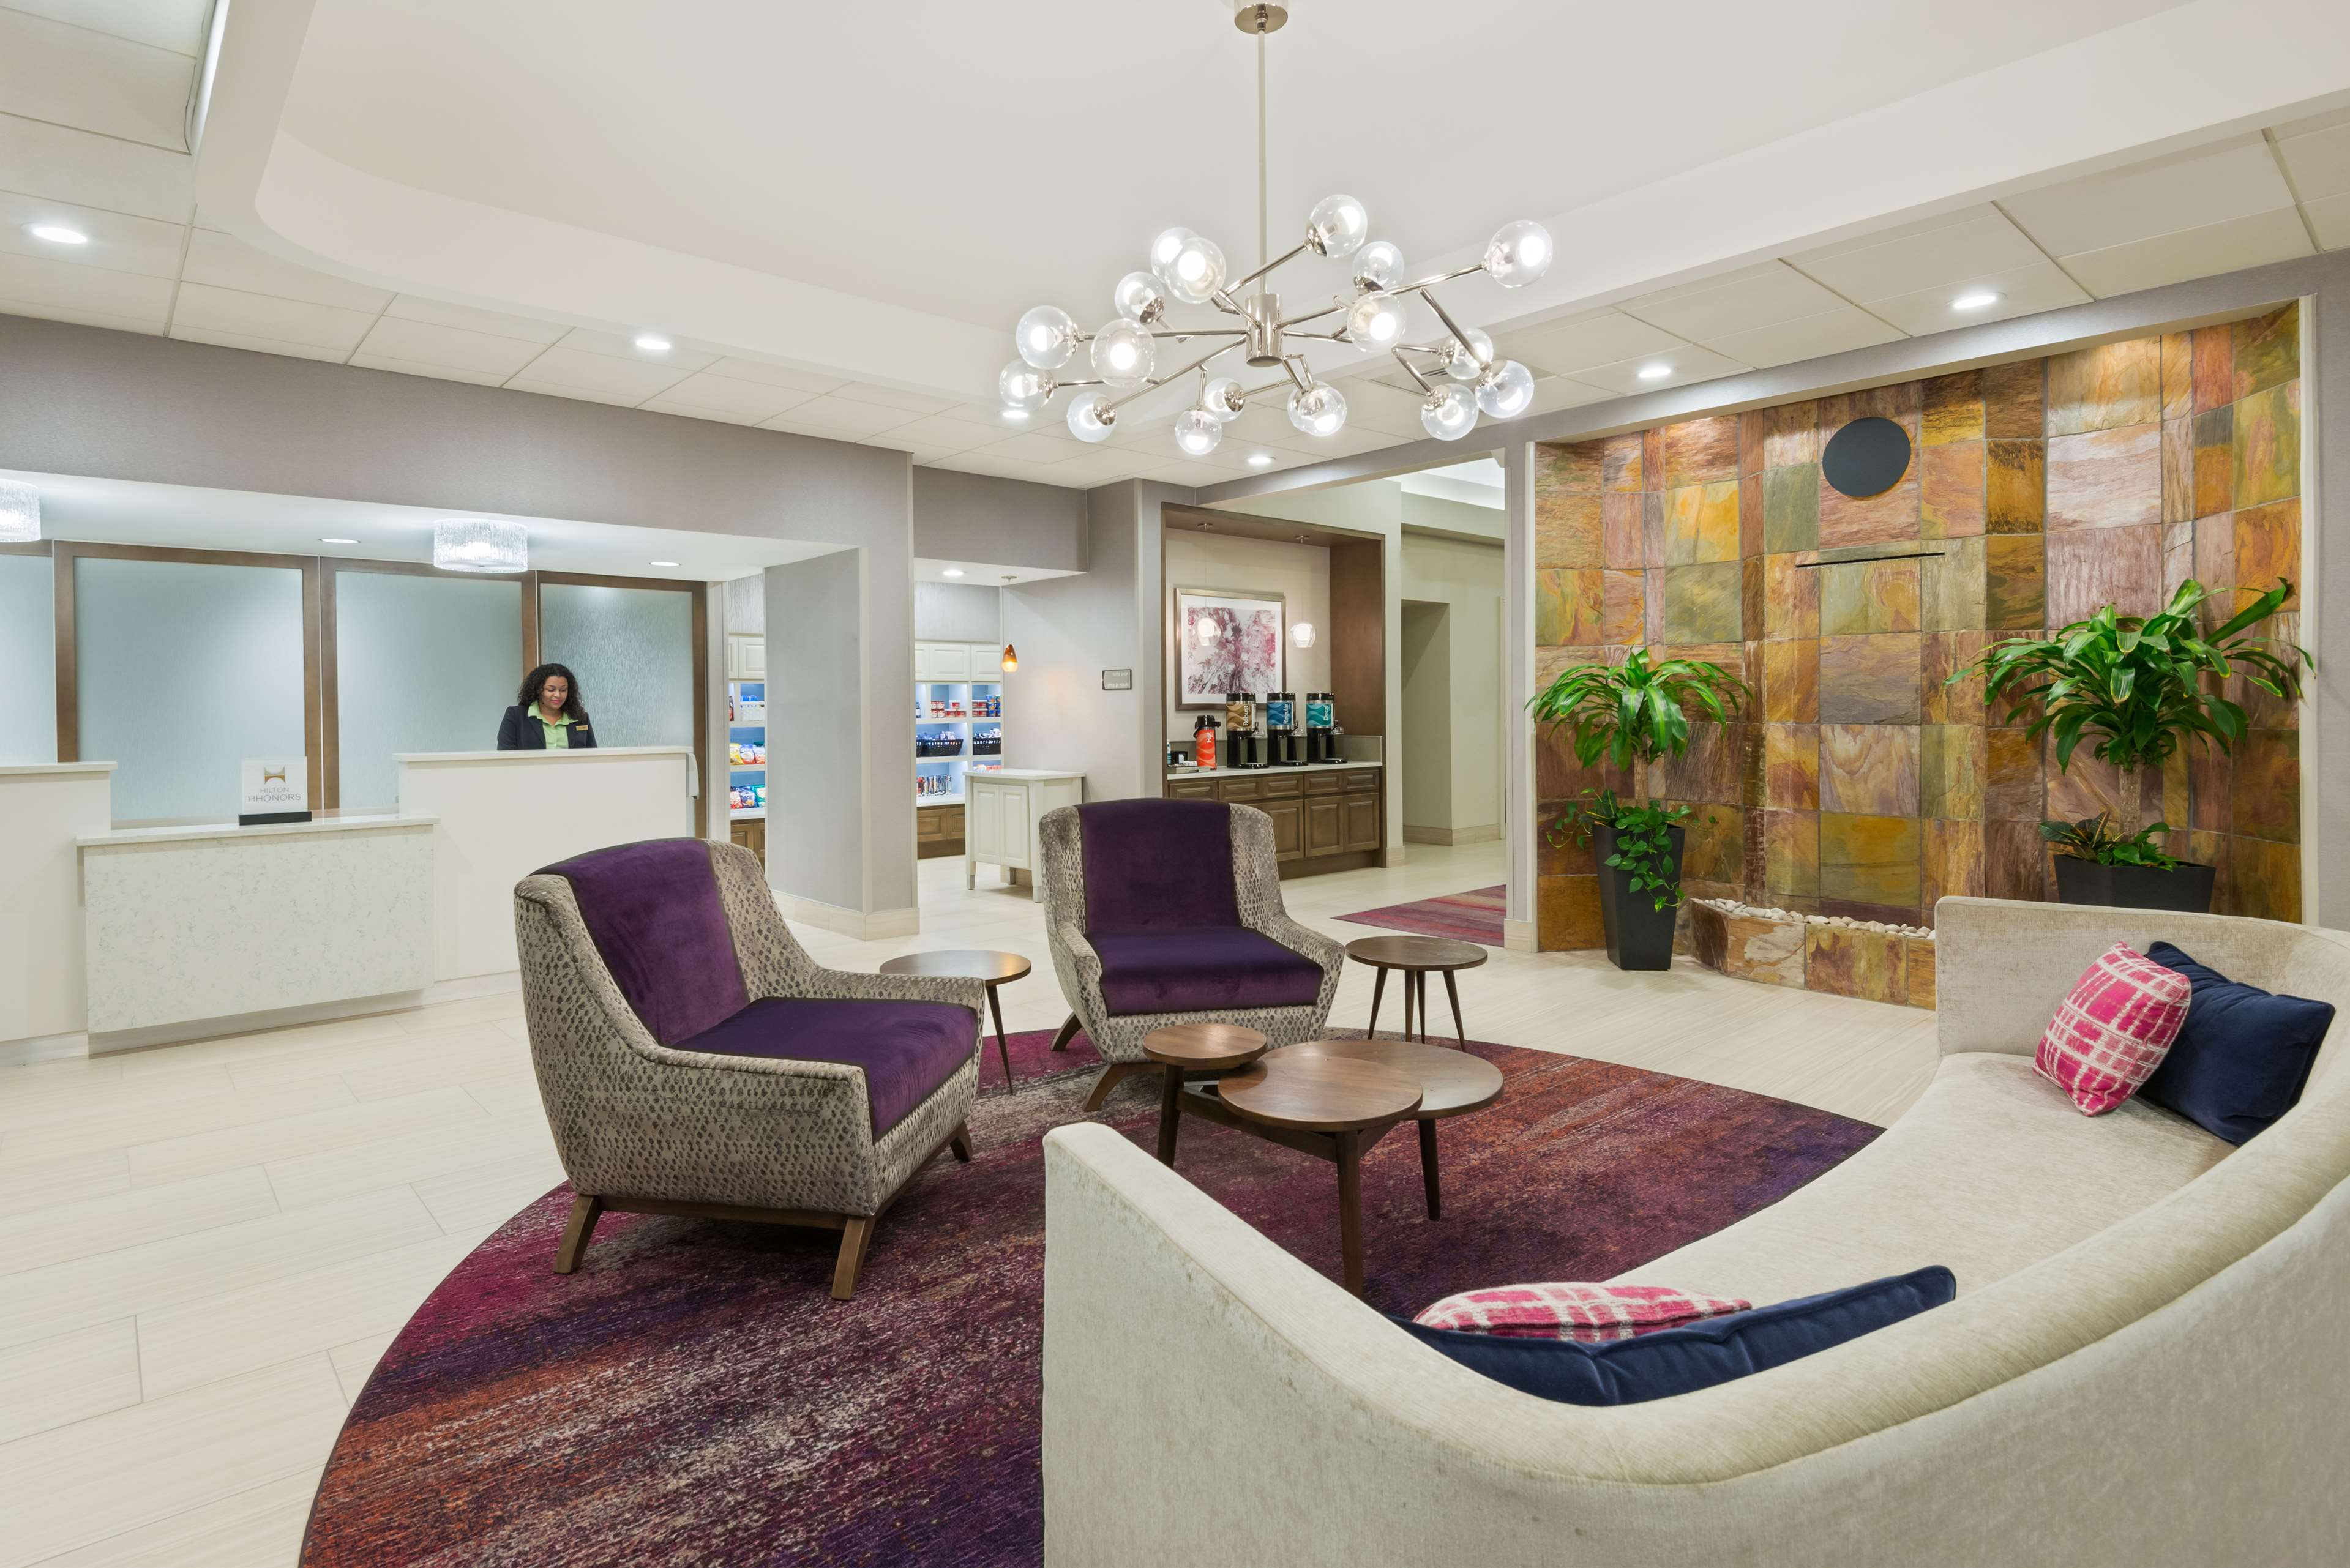 Homewood Suites by Hilton Orlando-UCF Area image 5